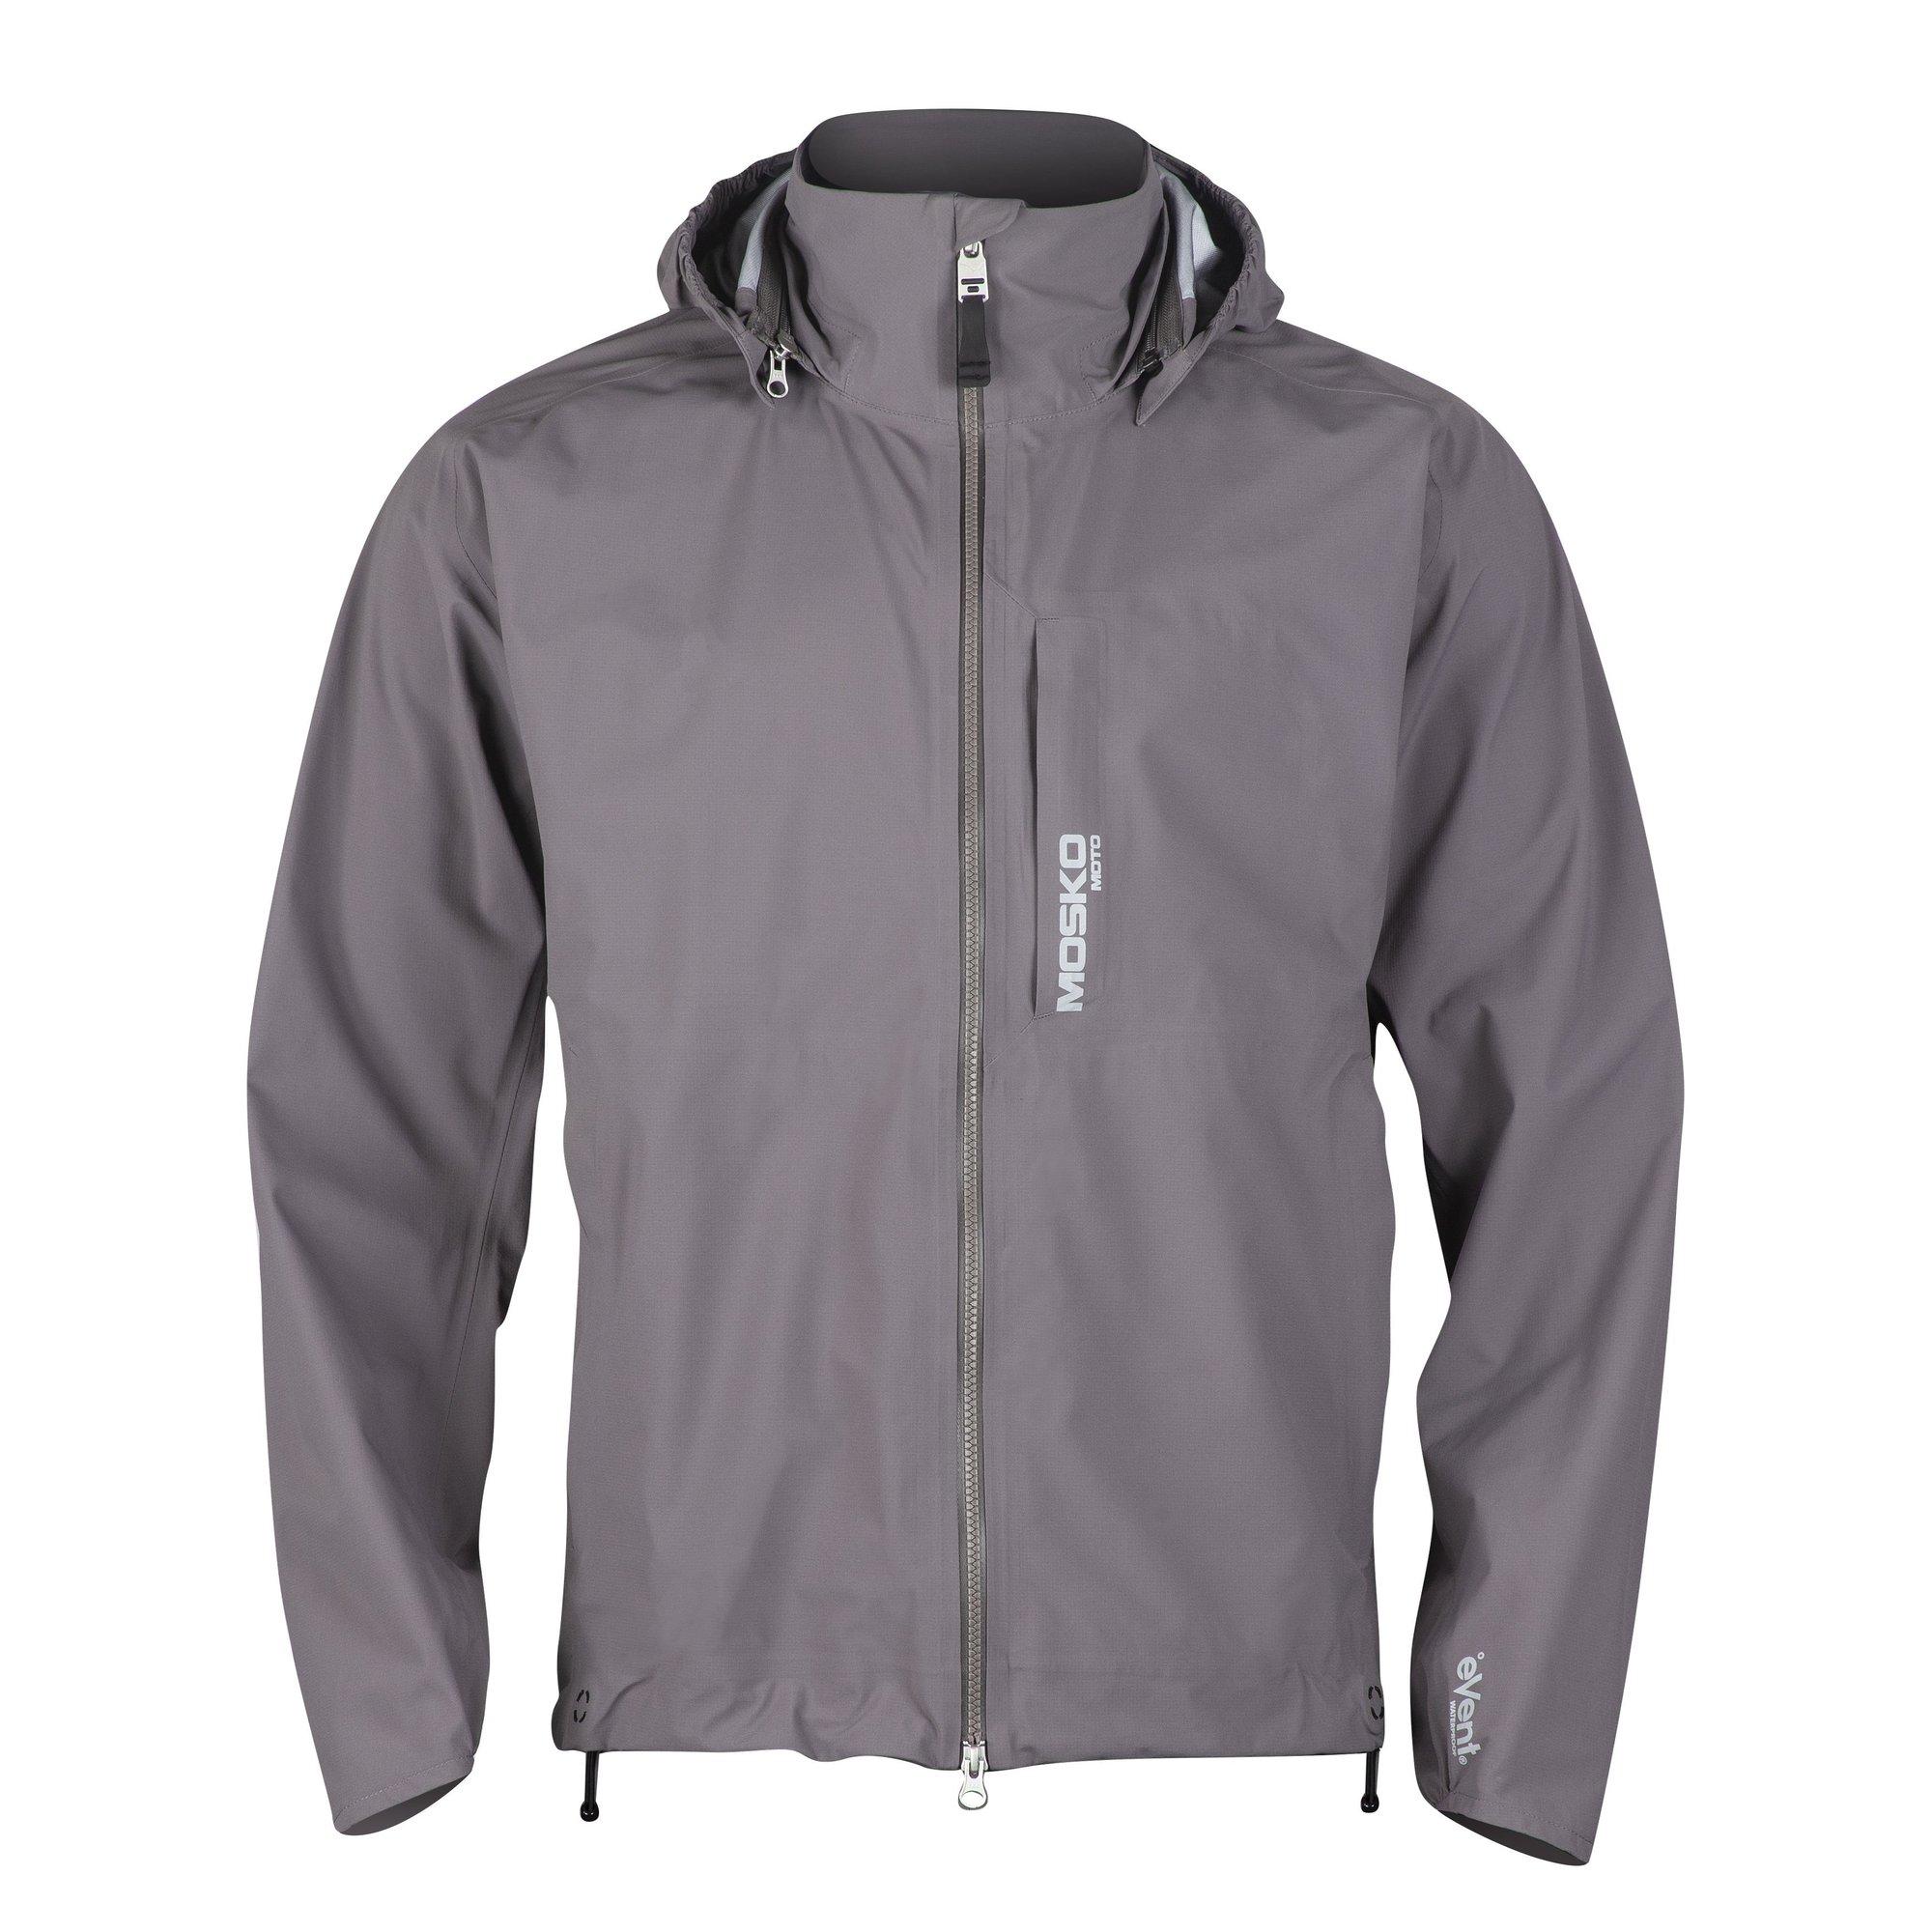 mosko-moto-apparel-deluge-jacket-11333165908029_2000x.jpg